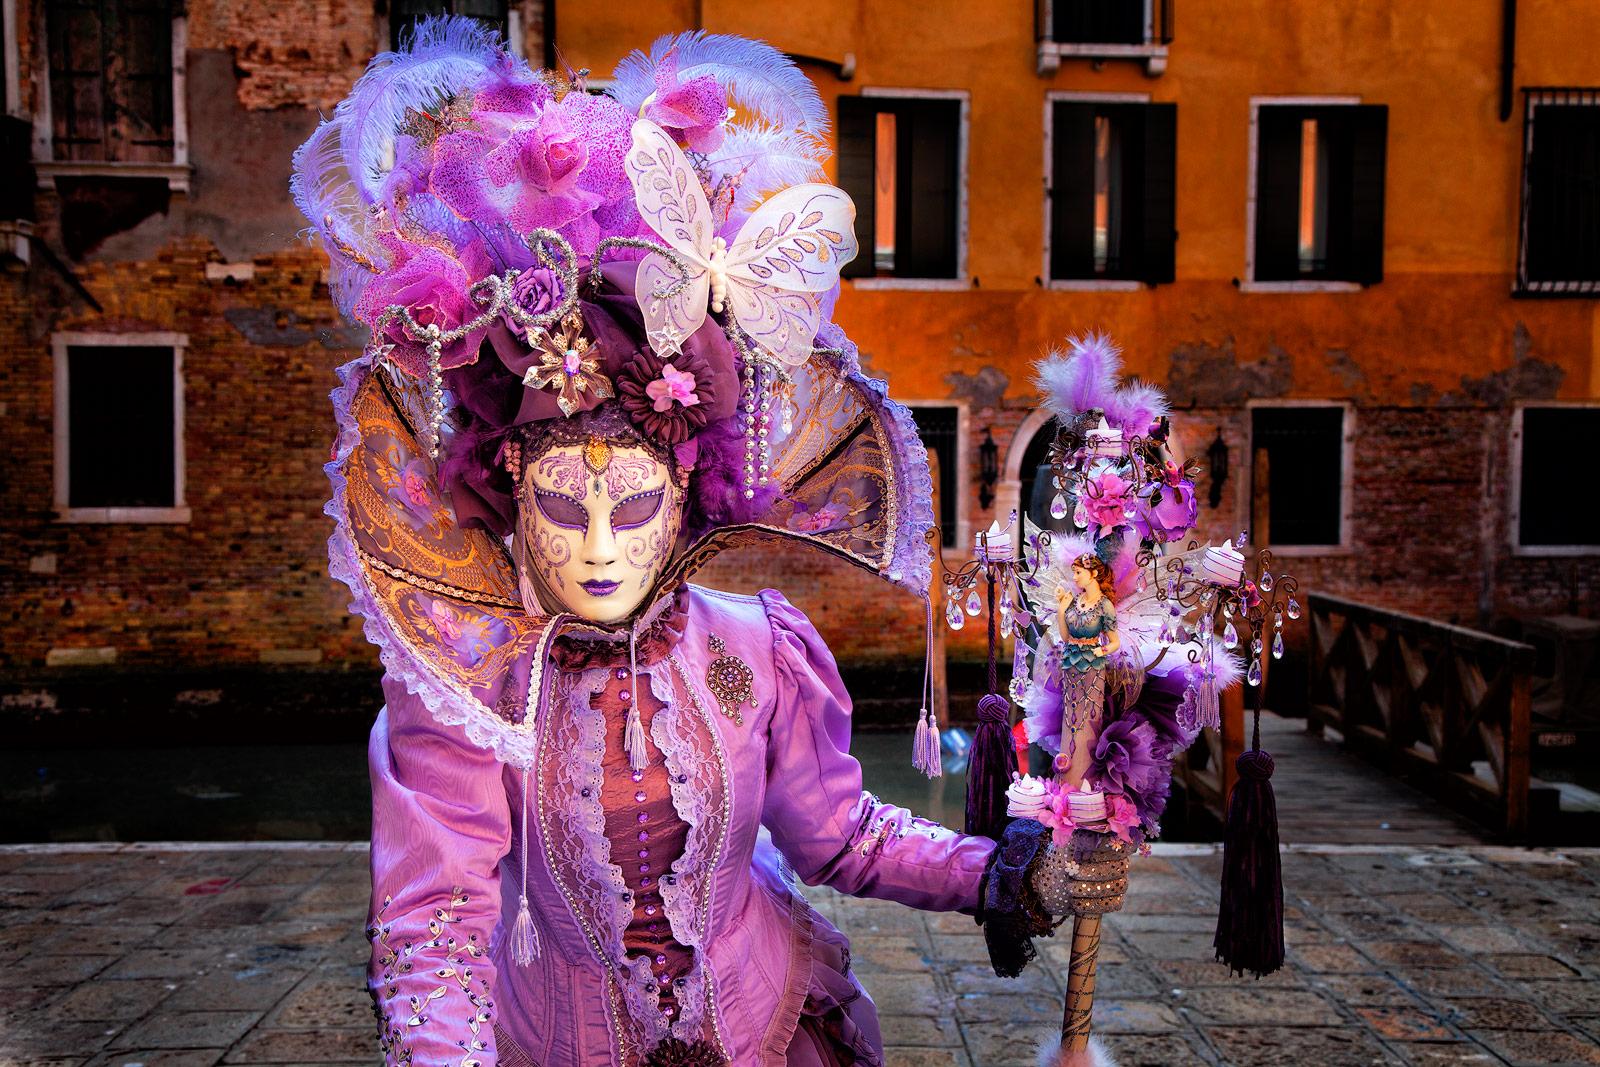 carnival, celebration, colorful, costume, europe, horizontal, italy, mask, party, purple, venice, photo